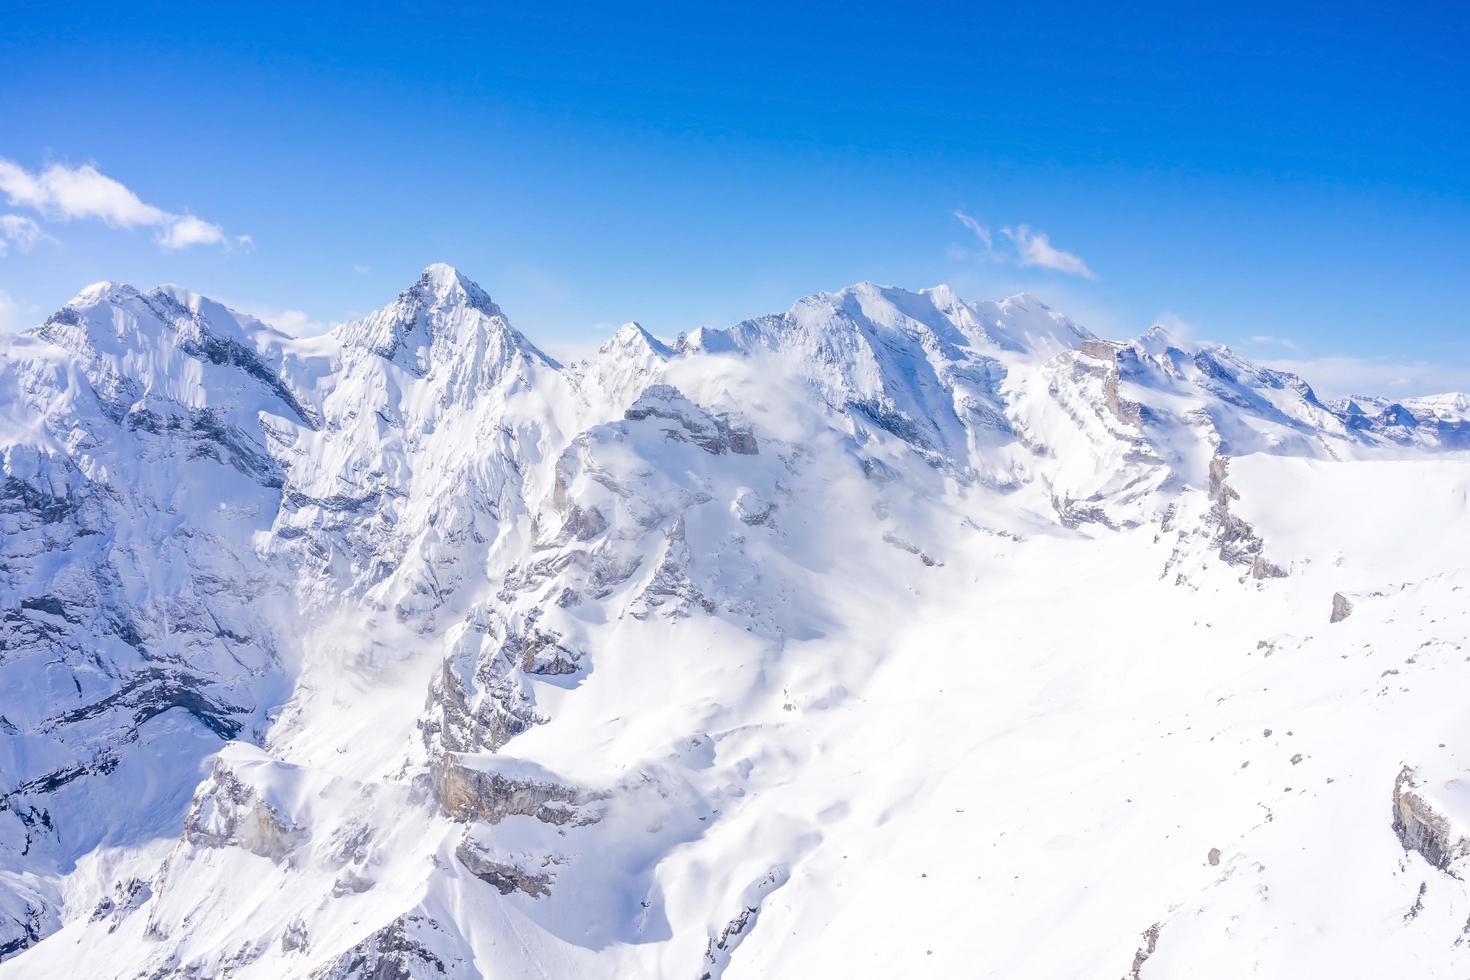 splendida vista sulle alpi svizzere foto